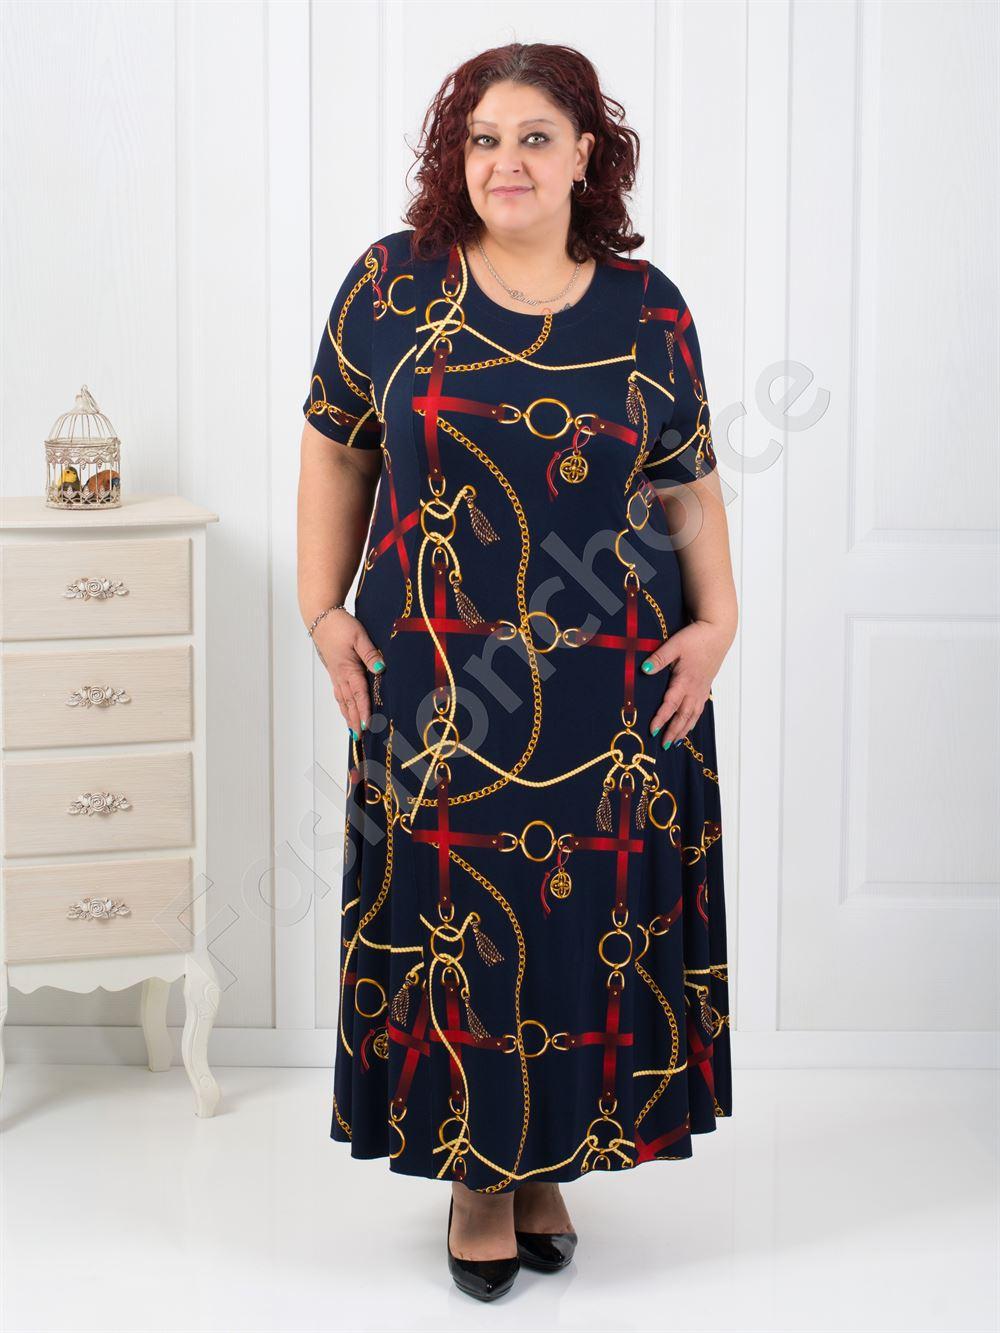 932200942d5b Plus size μακρύ εμπριμέ φόρεμα κωδ 070-3 από το fashionchoice.gr